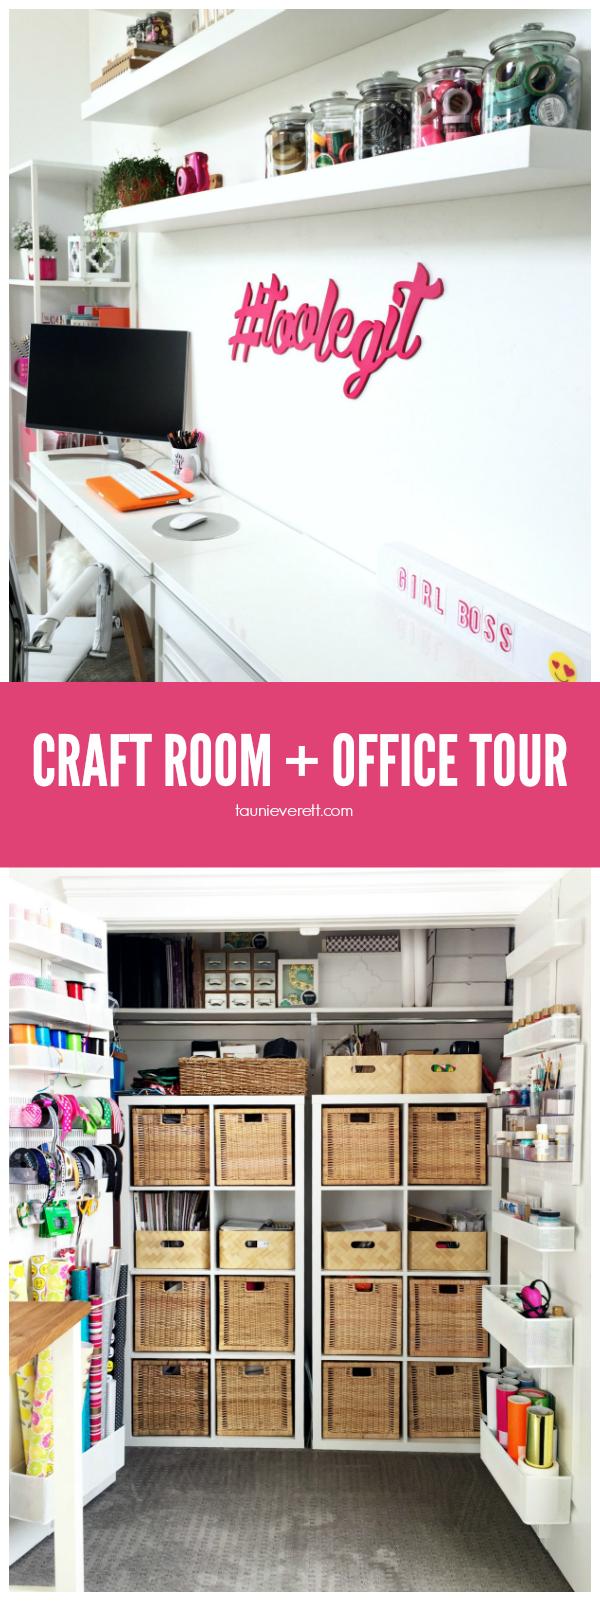 Amazing craft room ideas